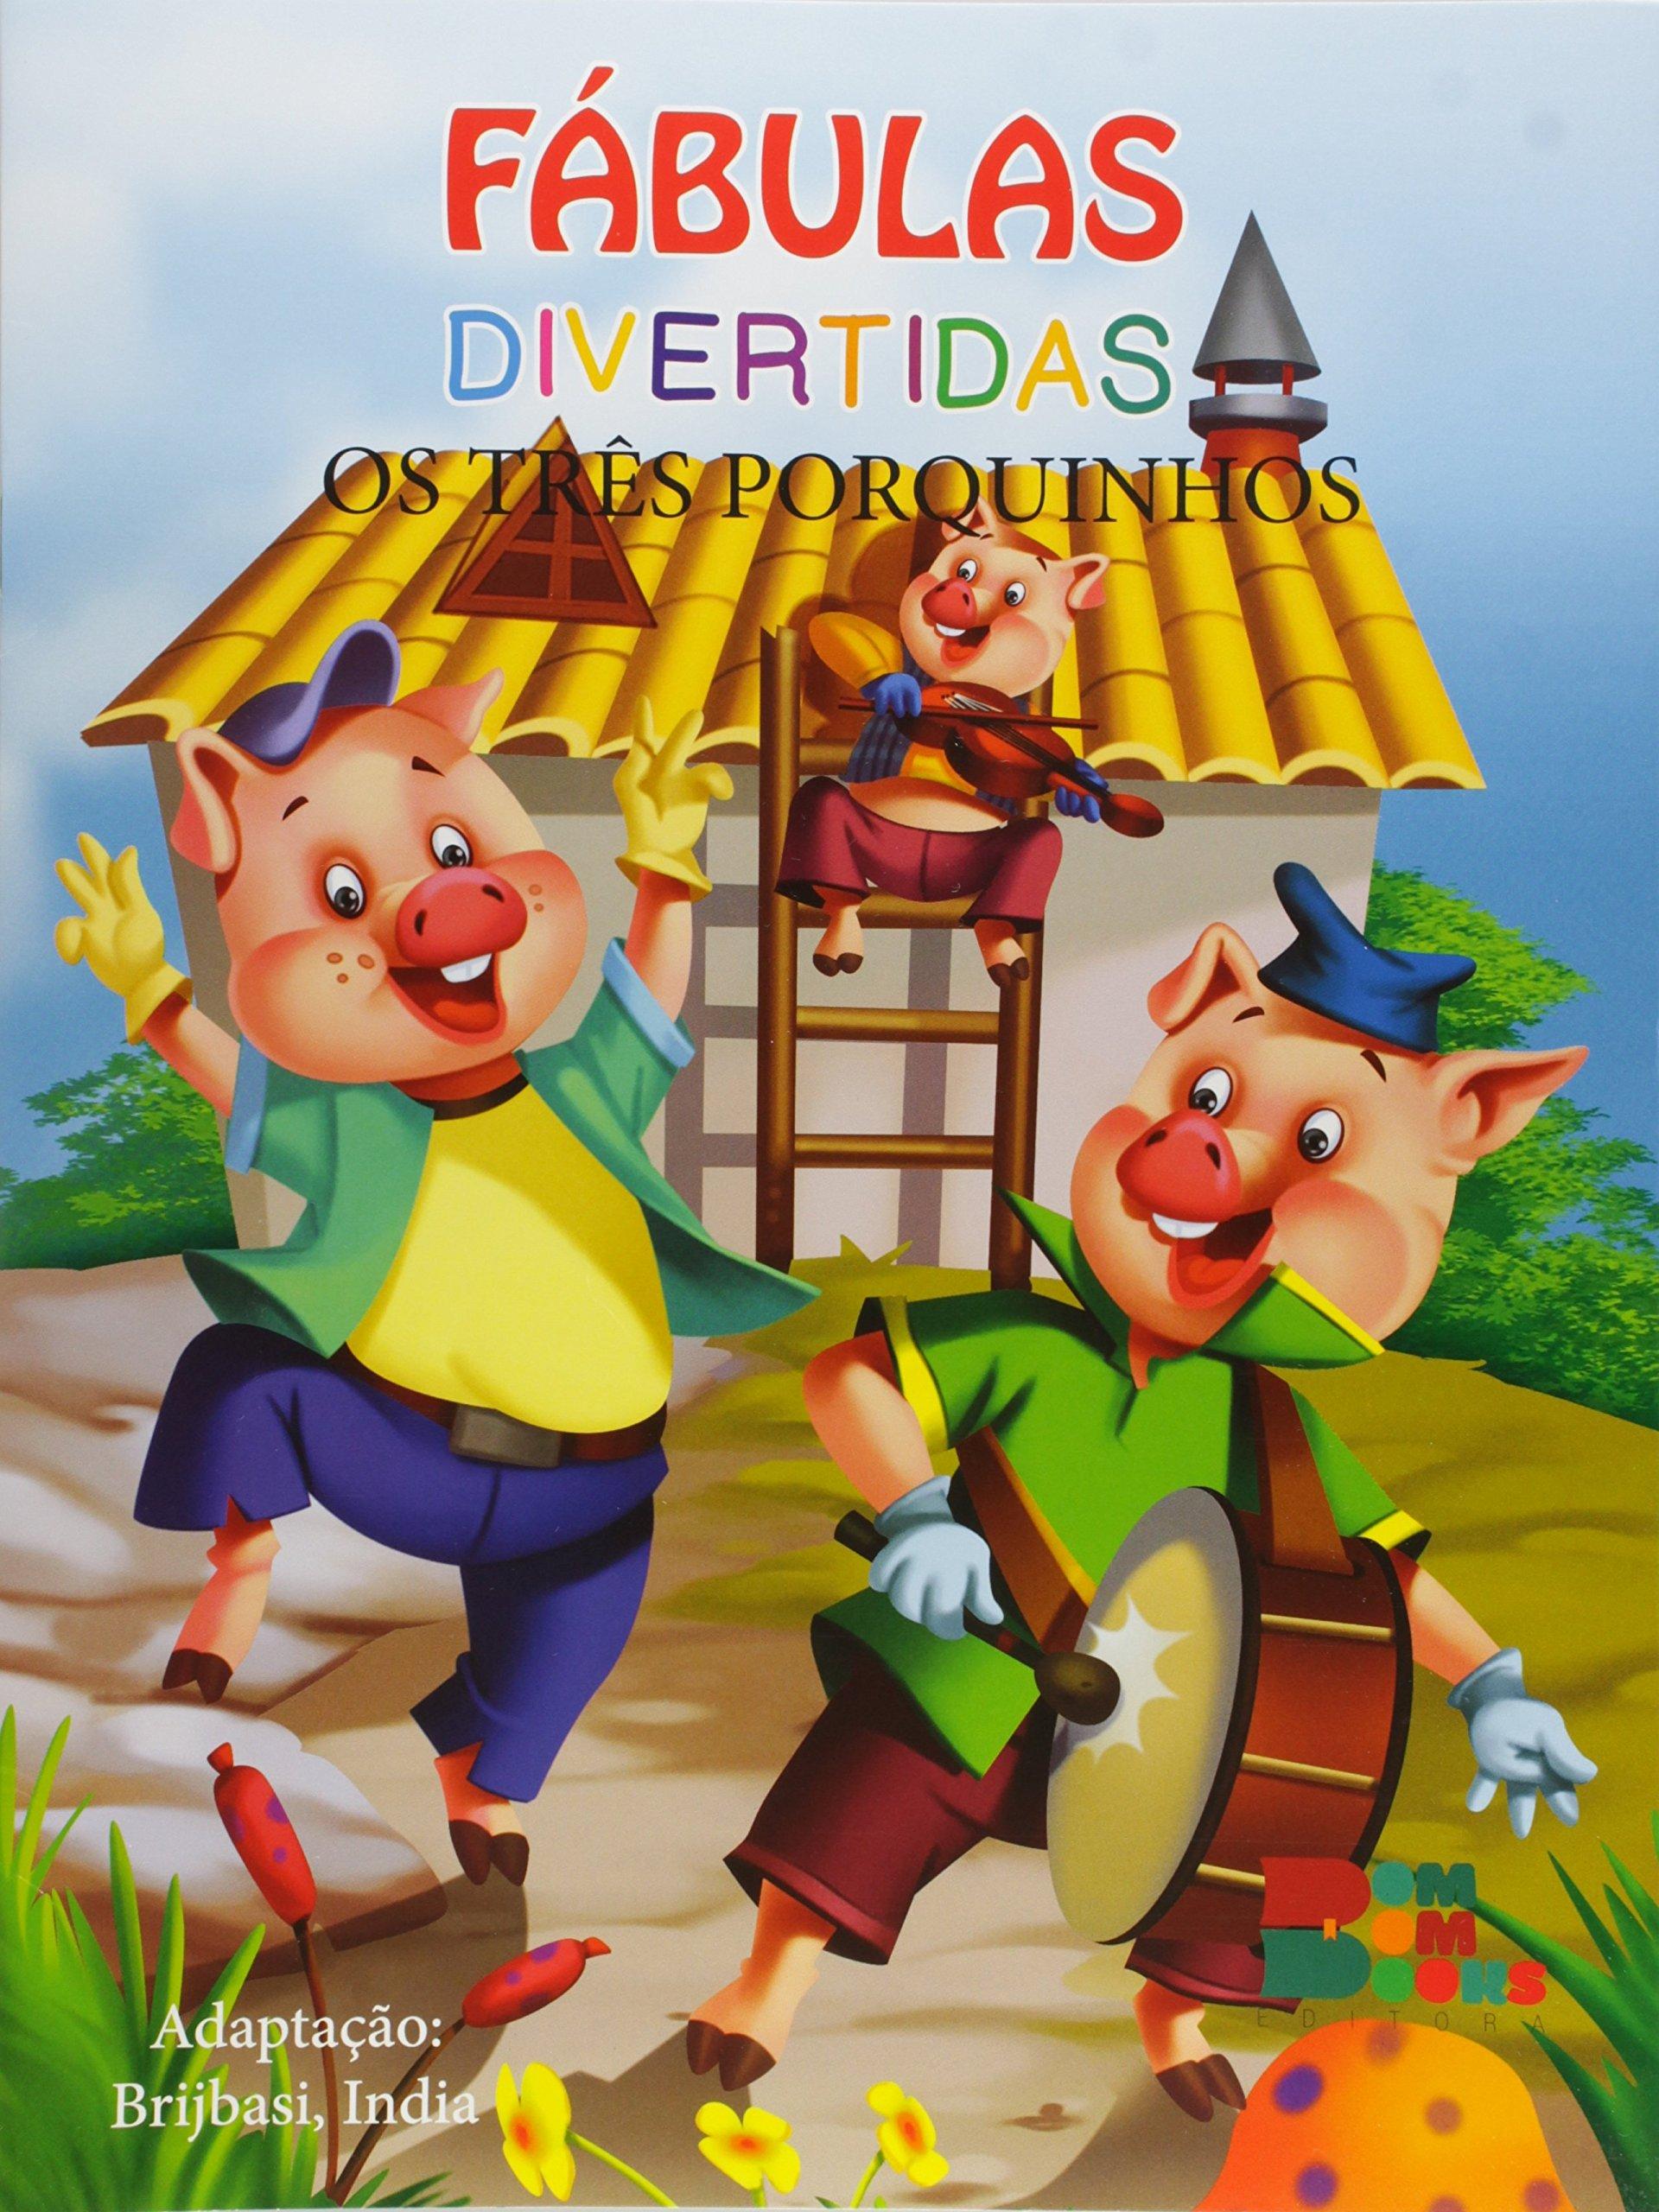 Fabulas Divertidas Os Tres Porquinhos Brijbasi India